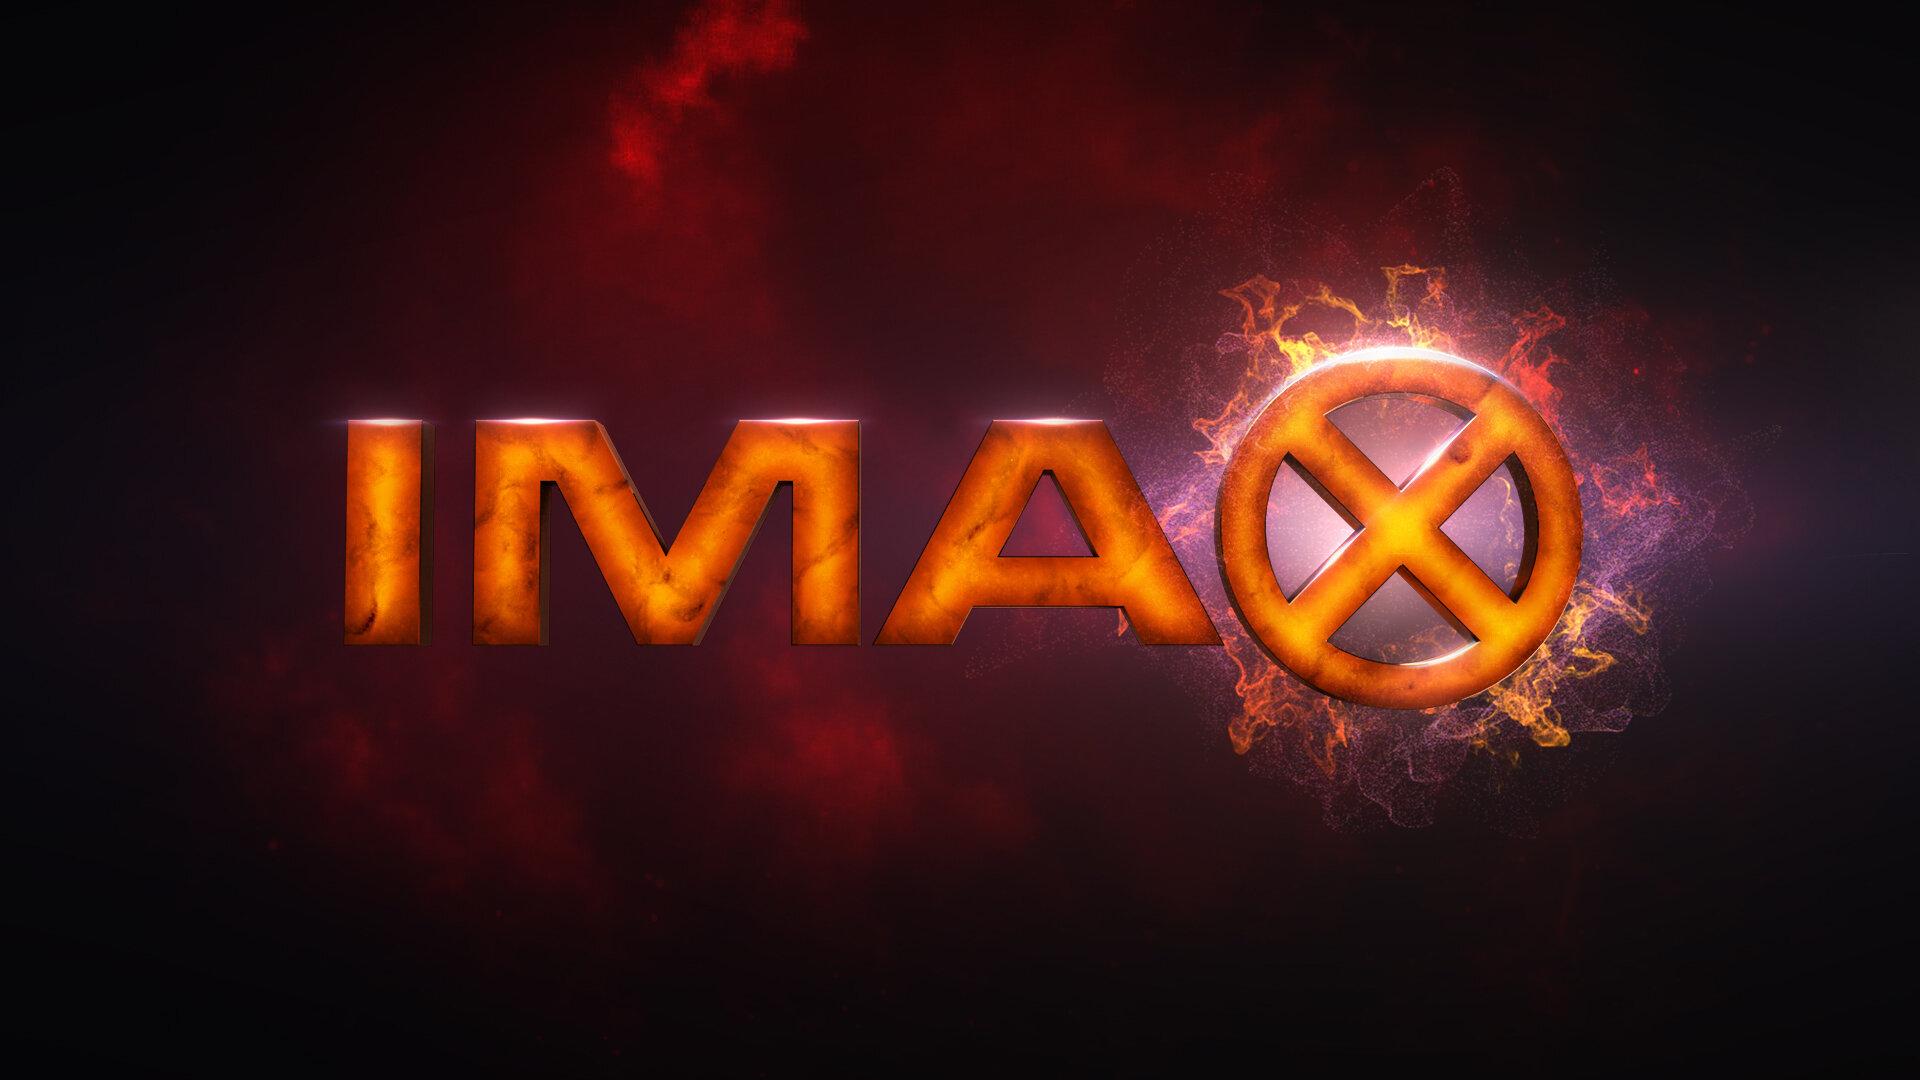 IMAX_DP_BL_03_05.jpg